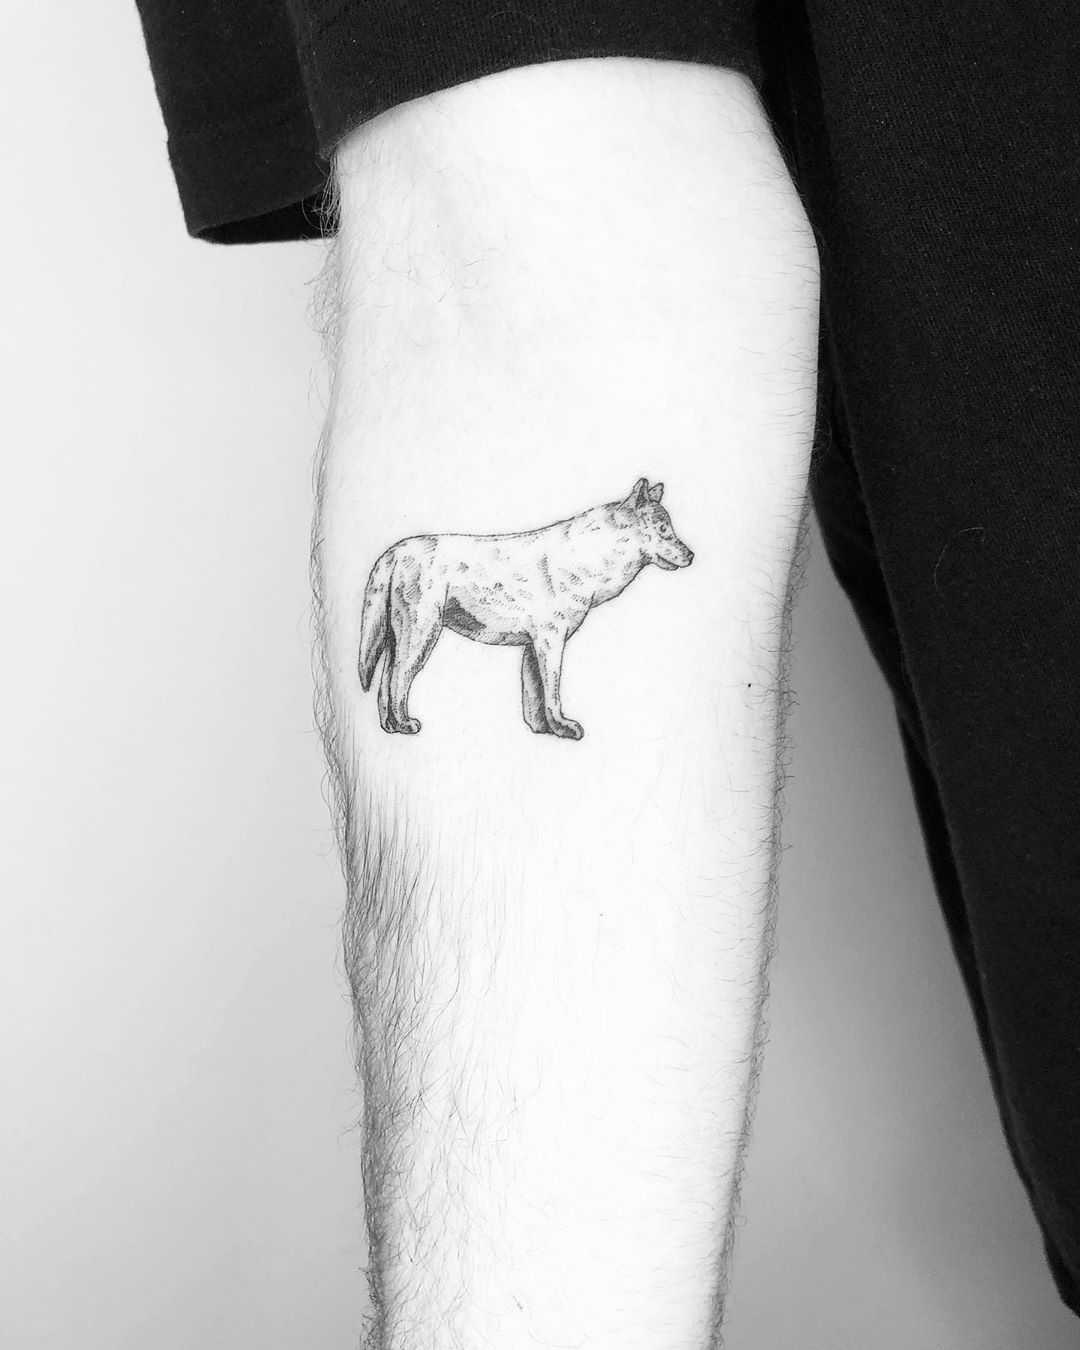 Wolf by Jake Harry Ditchfield